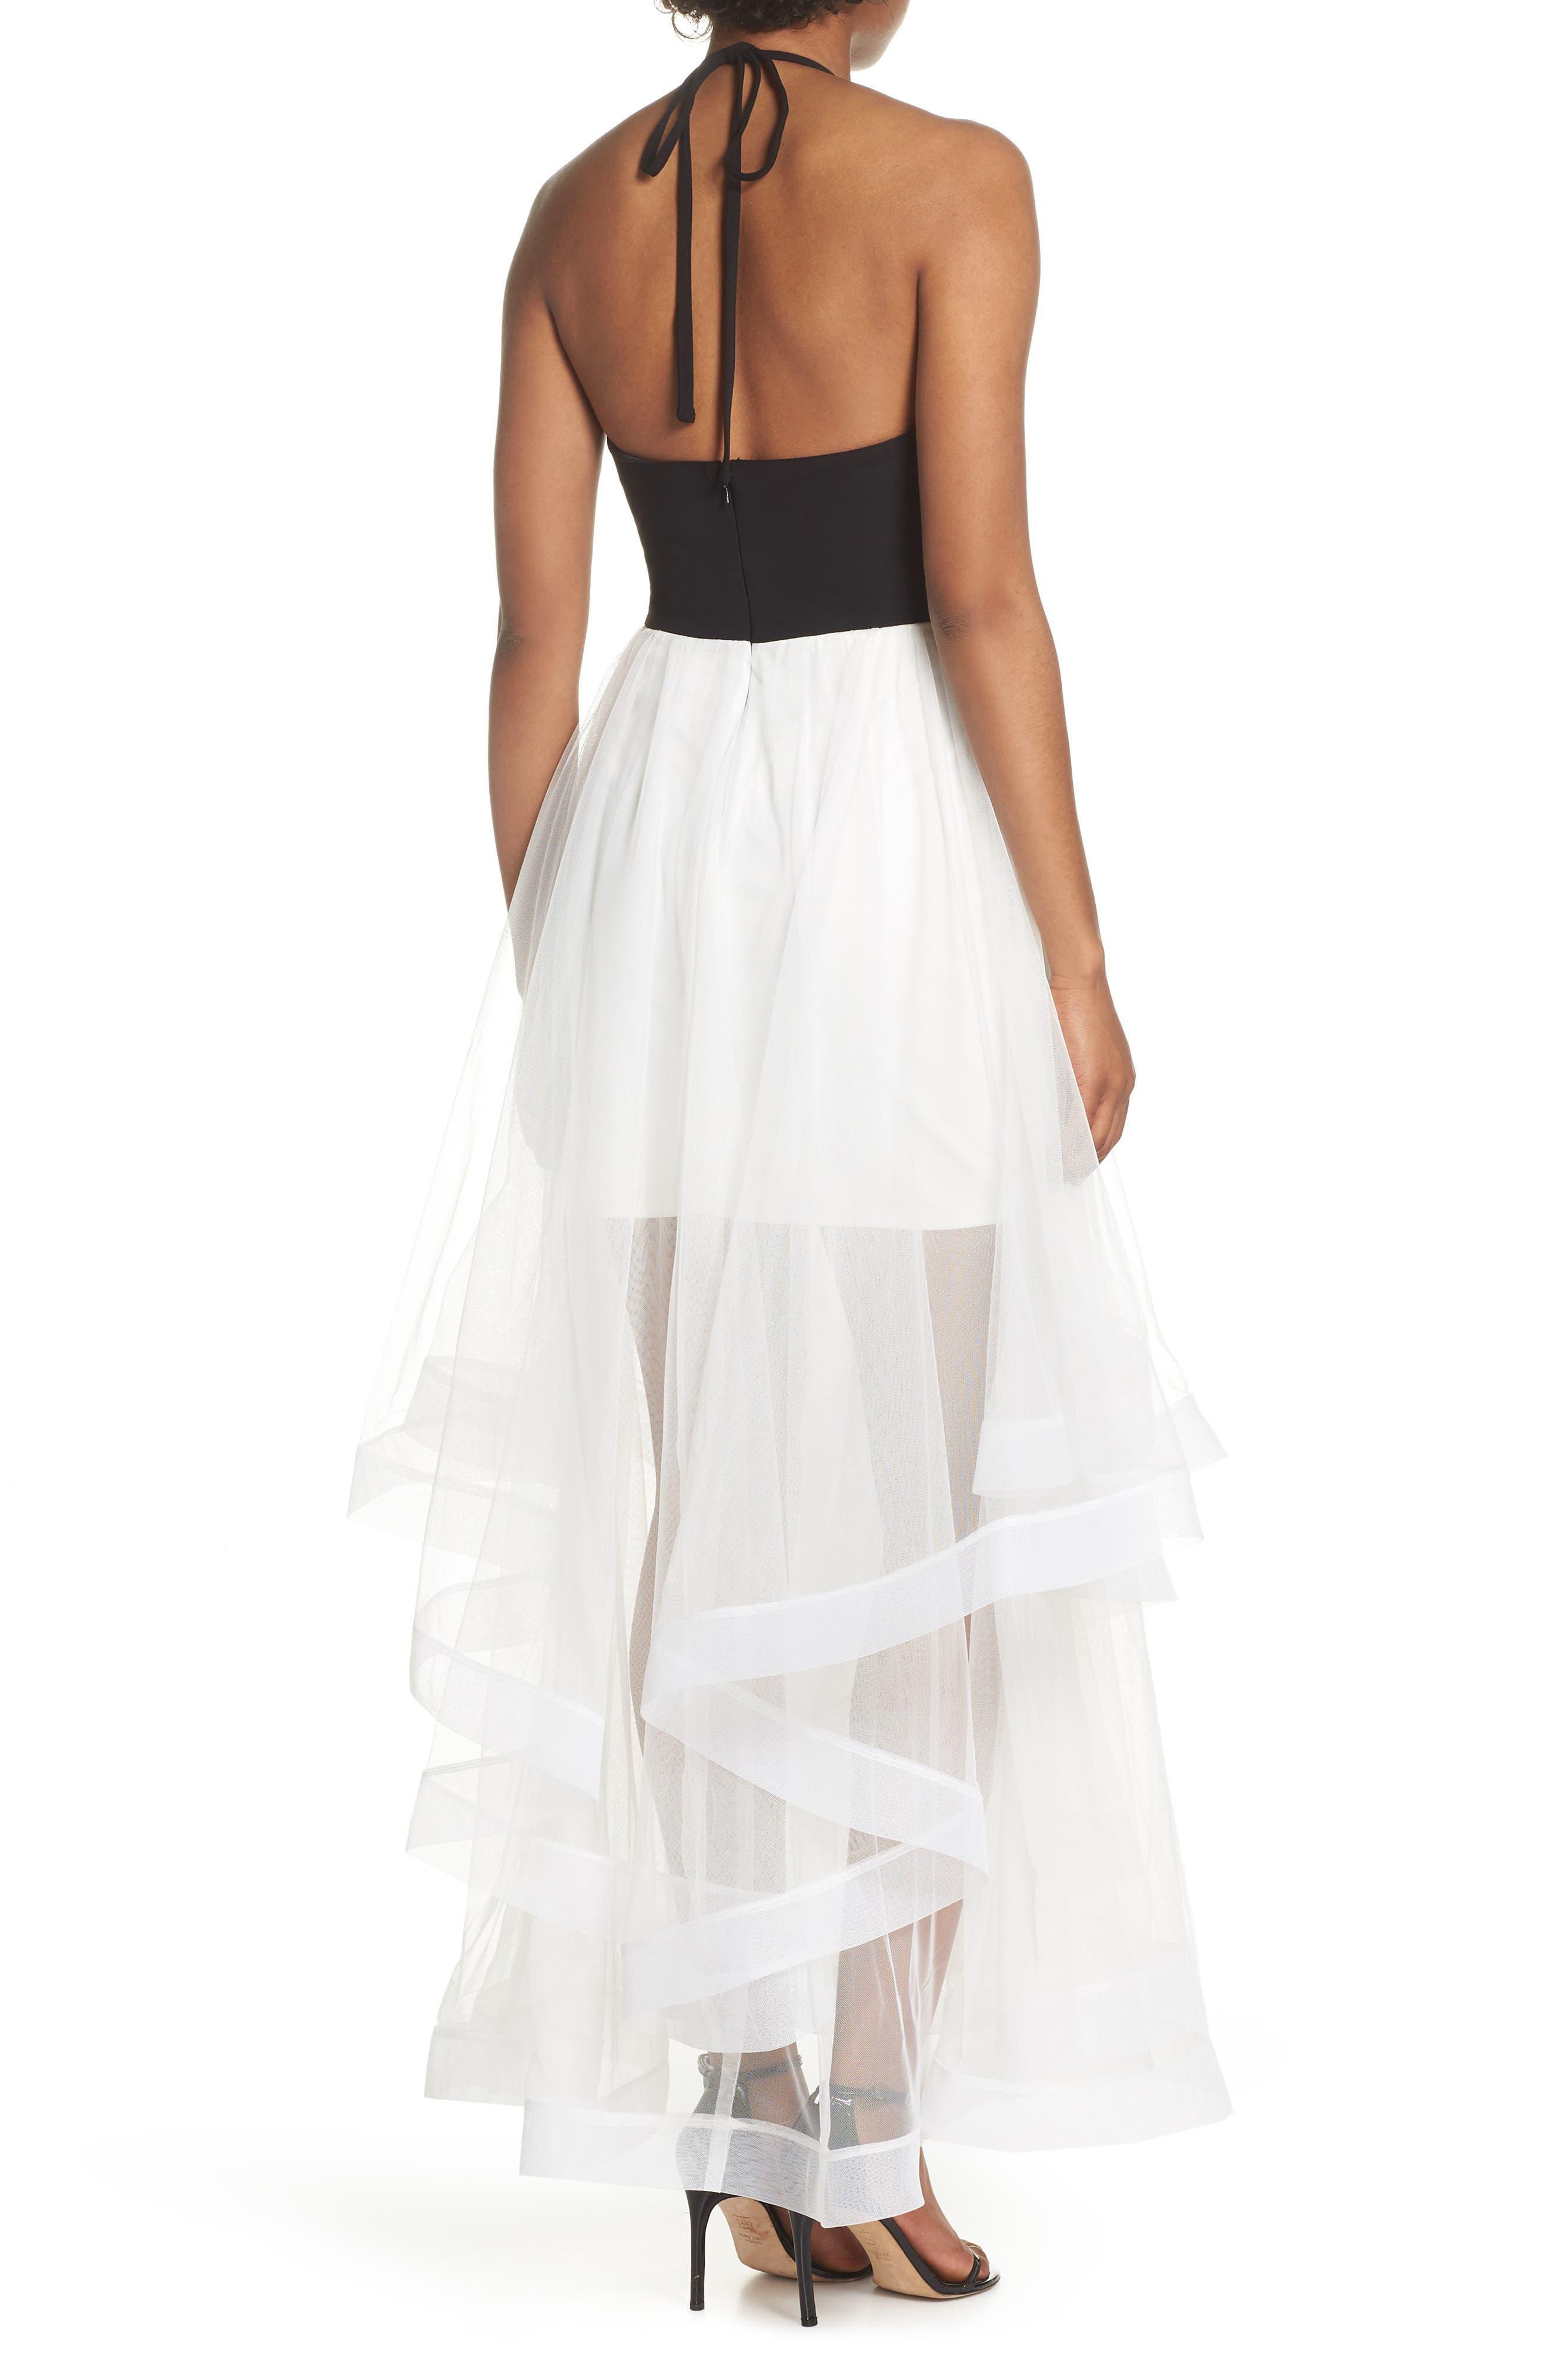 Appliqué Tiered Gown,                             Alternate thumbnail 2, color,                             Black/ Ivory